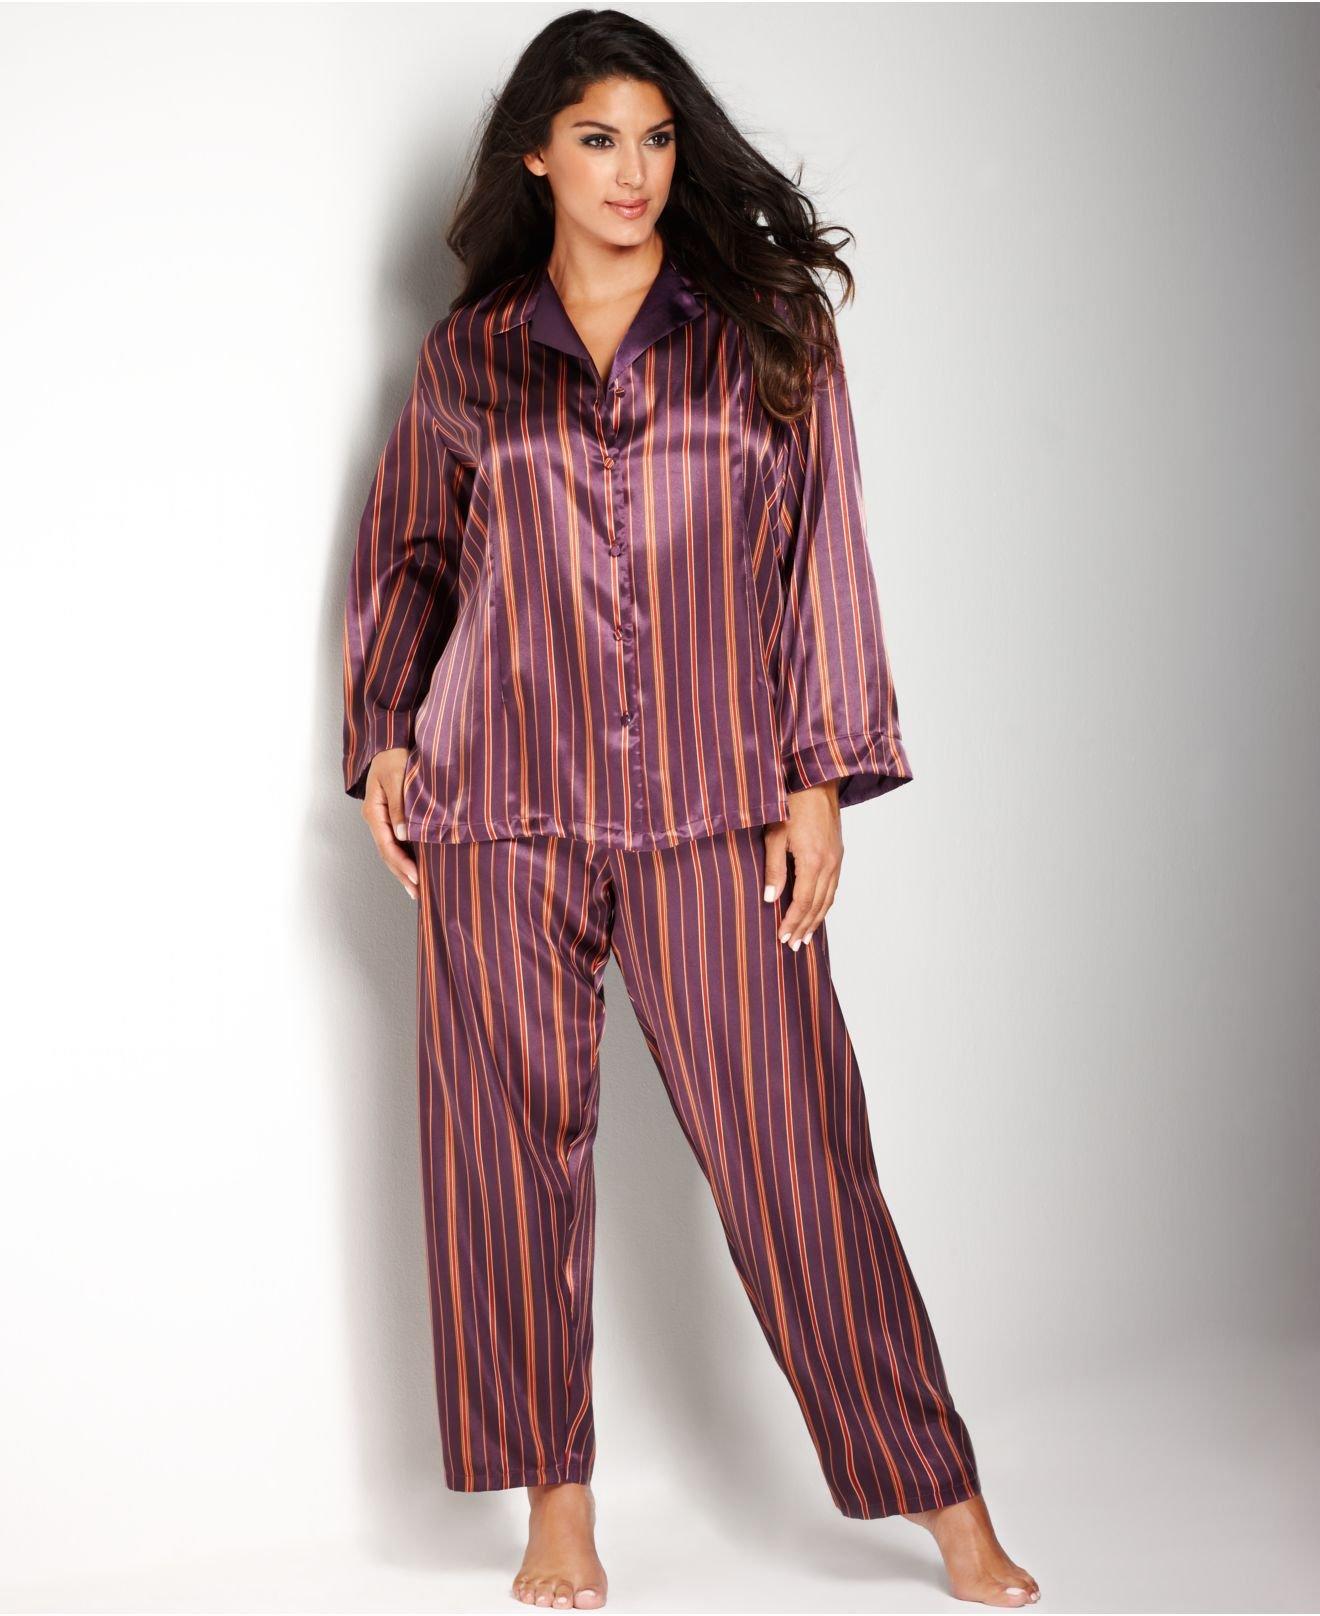 5a907f5596c59 Lyst - Jones New York Plus Size Printed Satin Pajama Set in Purple